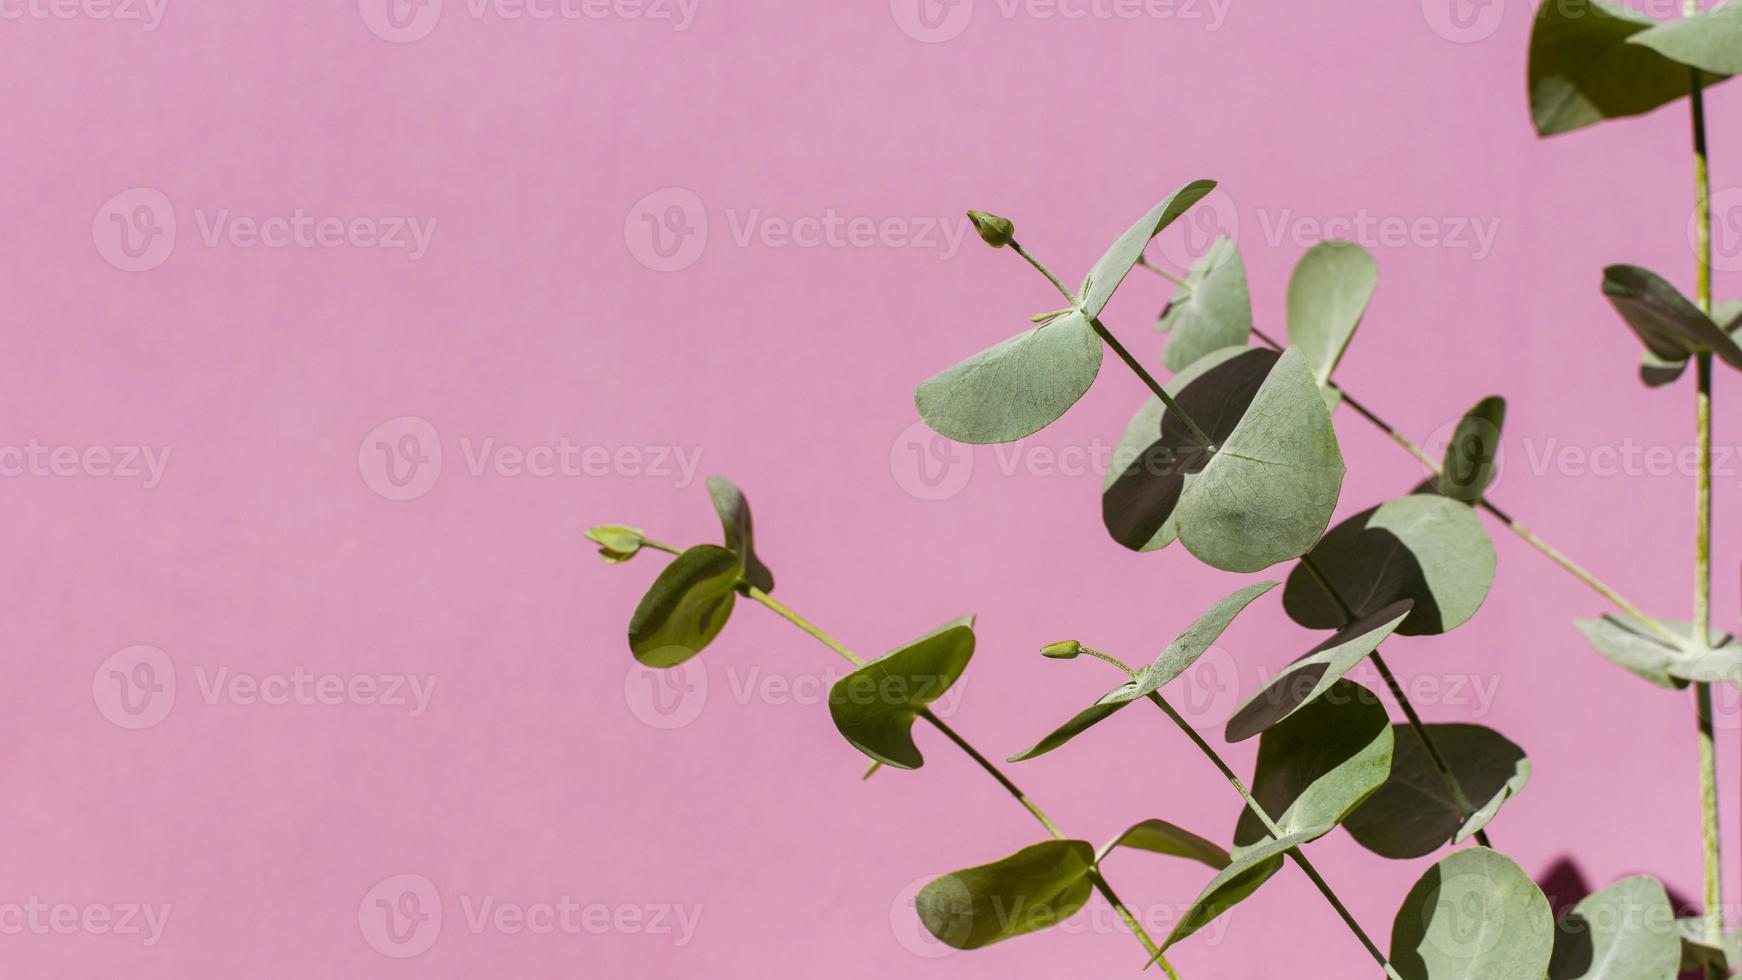 Eucalyptus plant on pink background photo